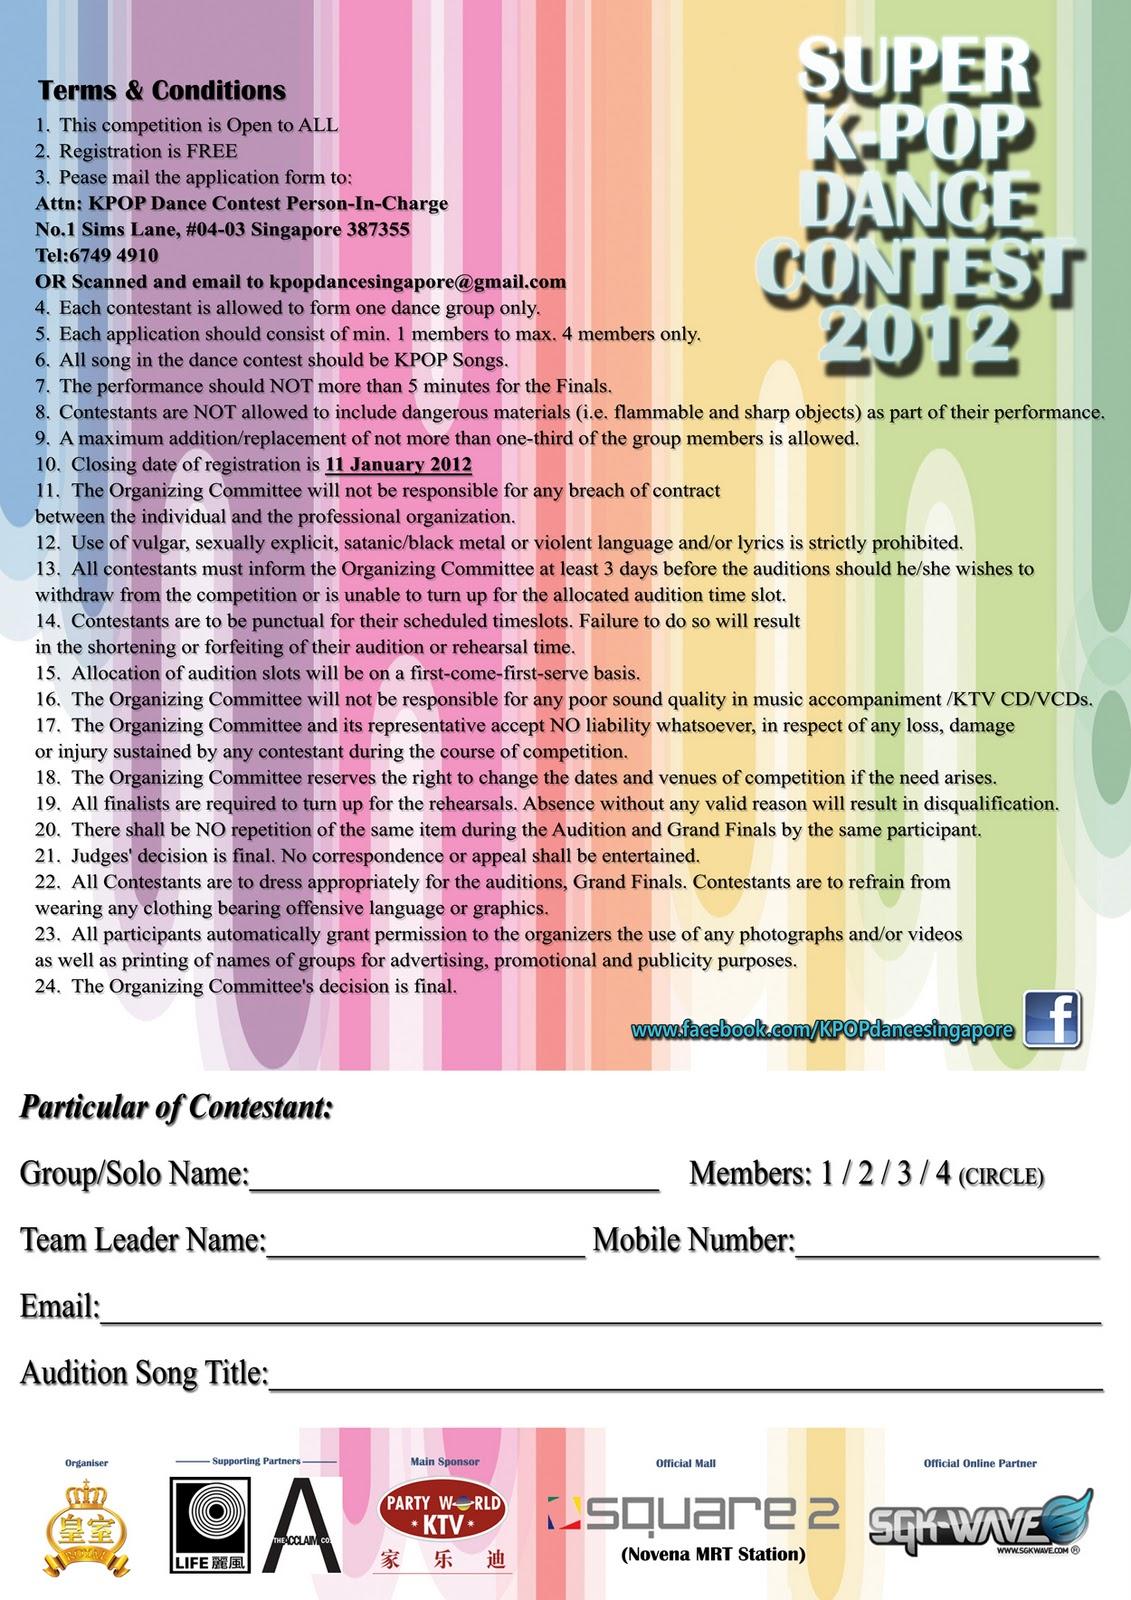 Muzfishy World: Super Kpop Dance Contest on Singapore